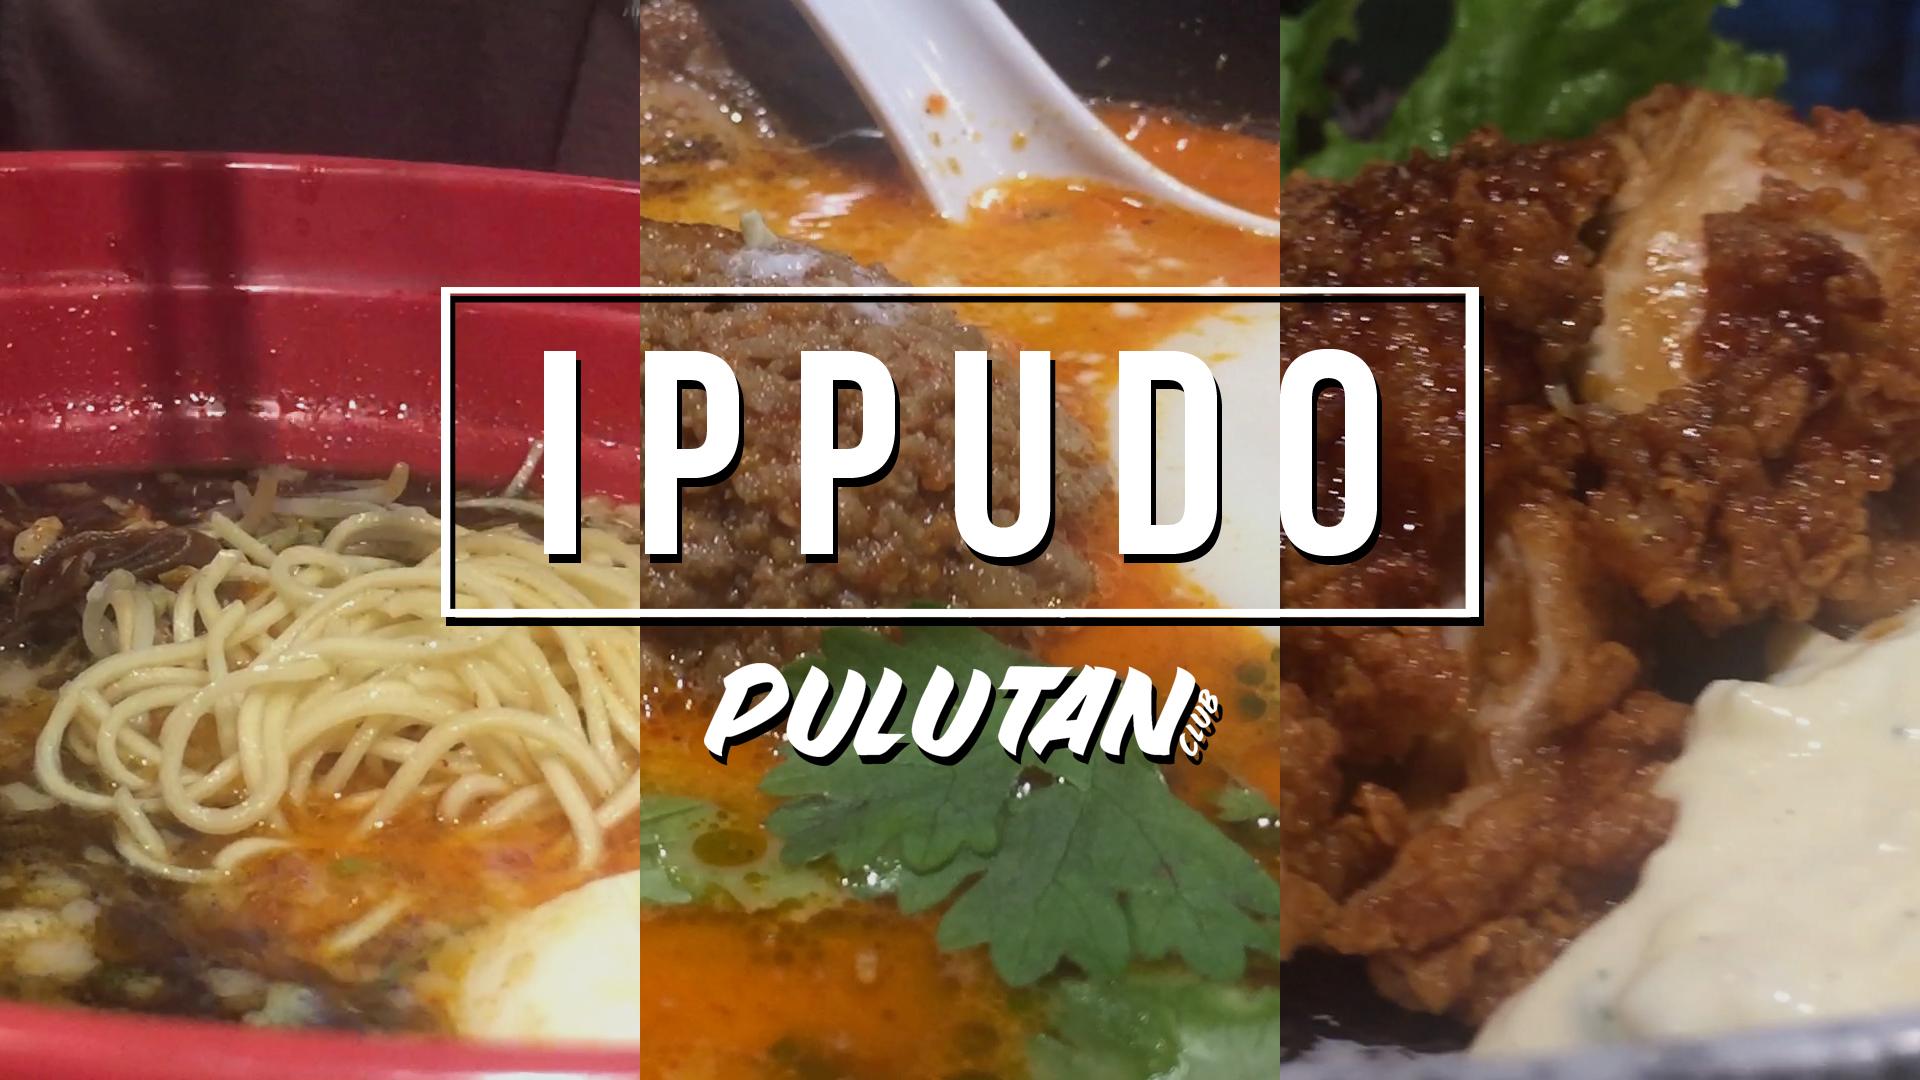 Quick Trip to Ippudo